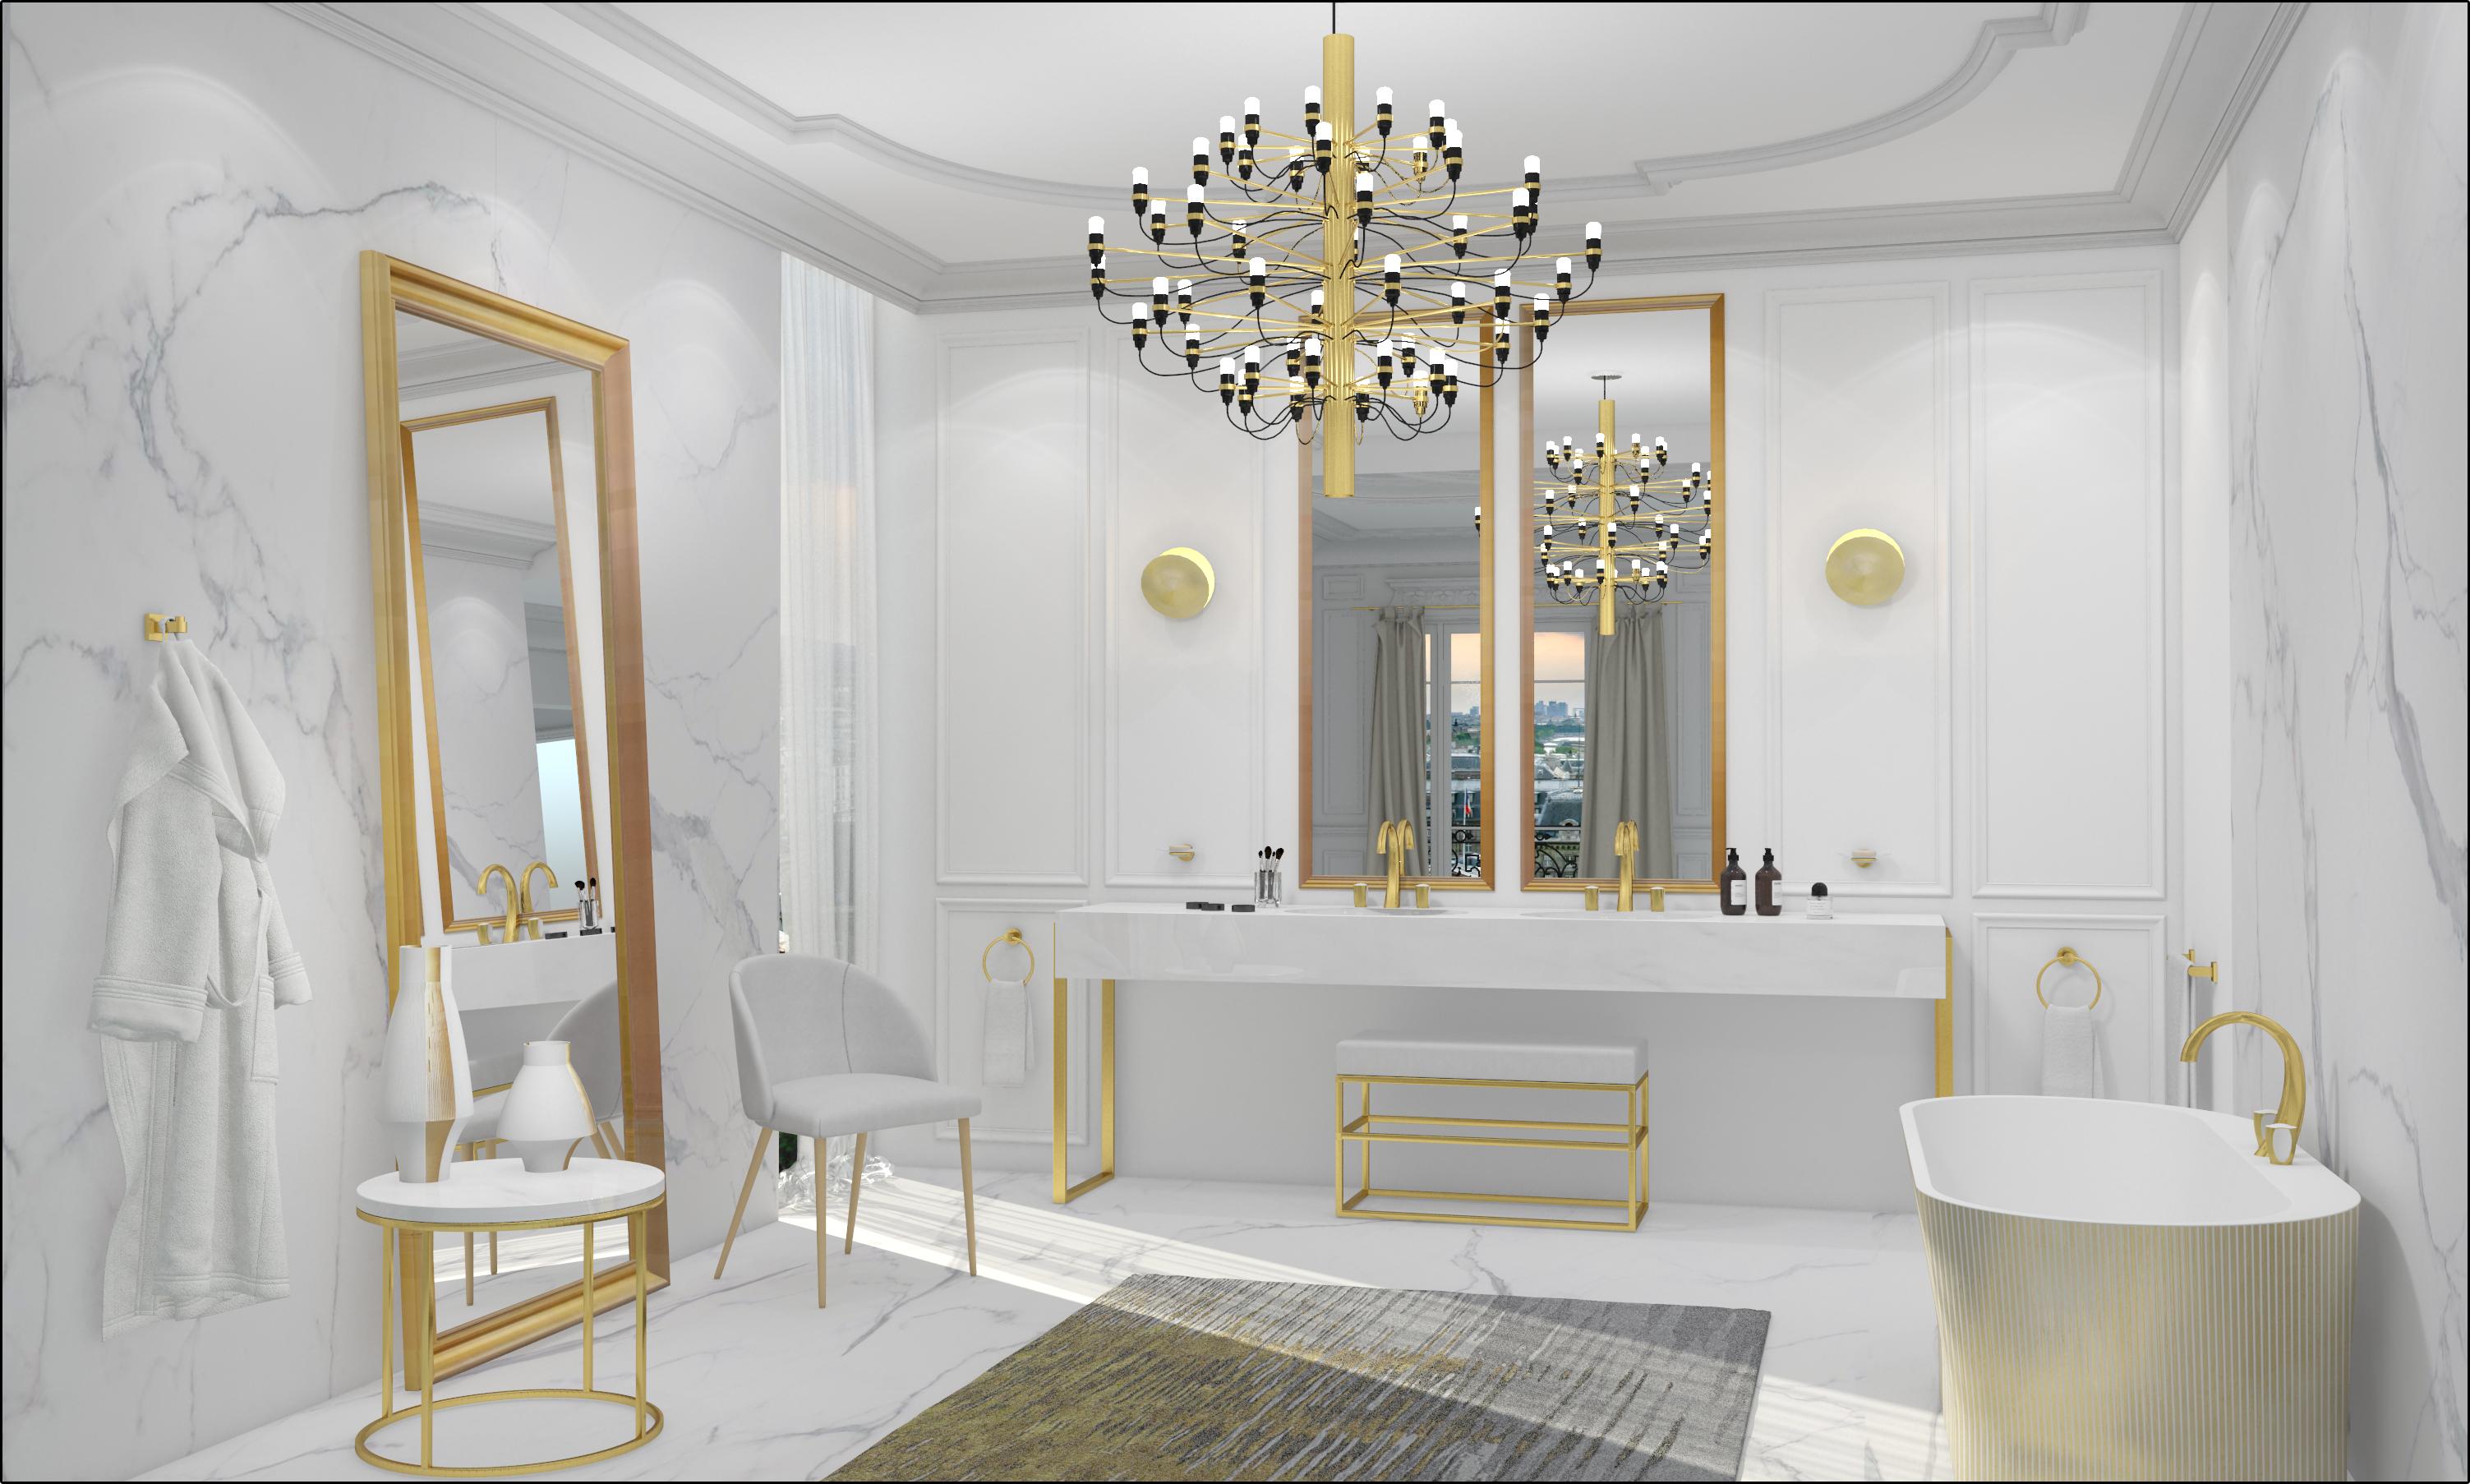 Ascot bathroom design | Concept Design